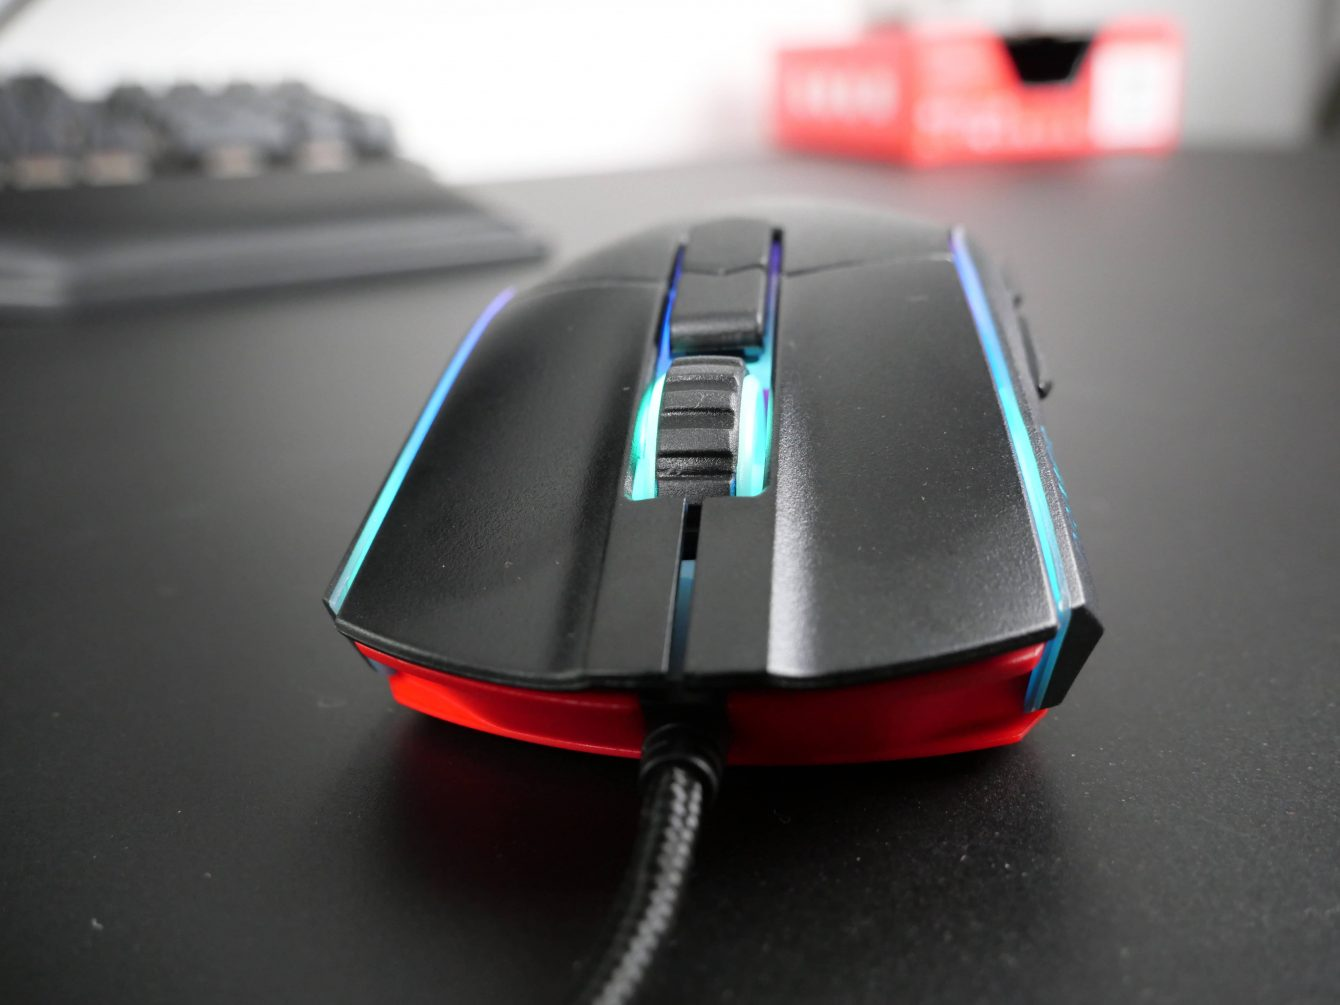 XPG PRIMER review: the gaming mouse according to XPG